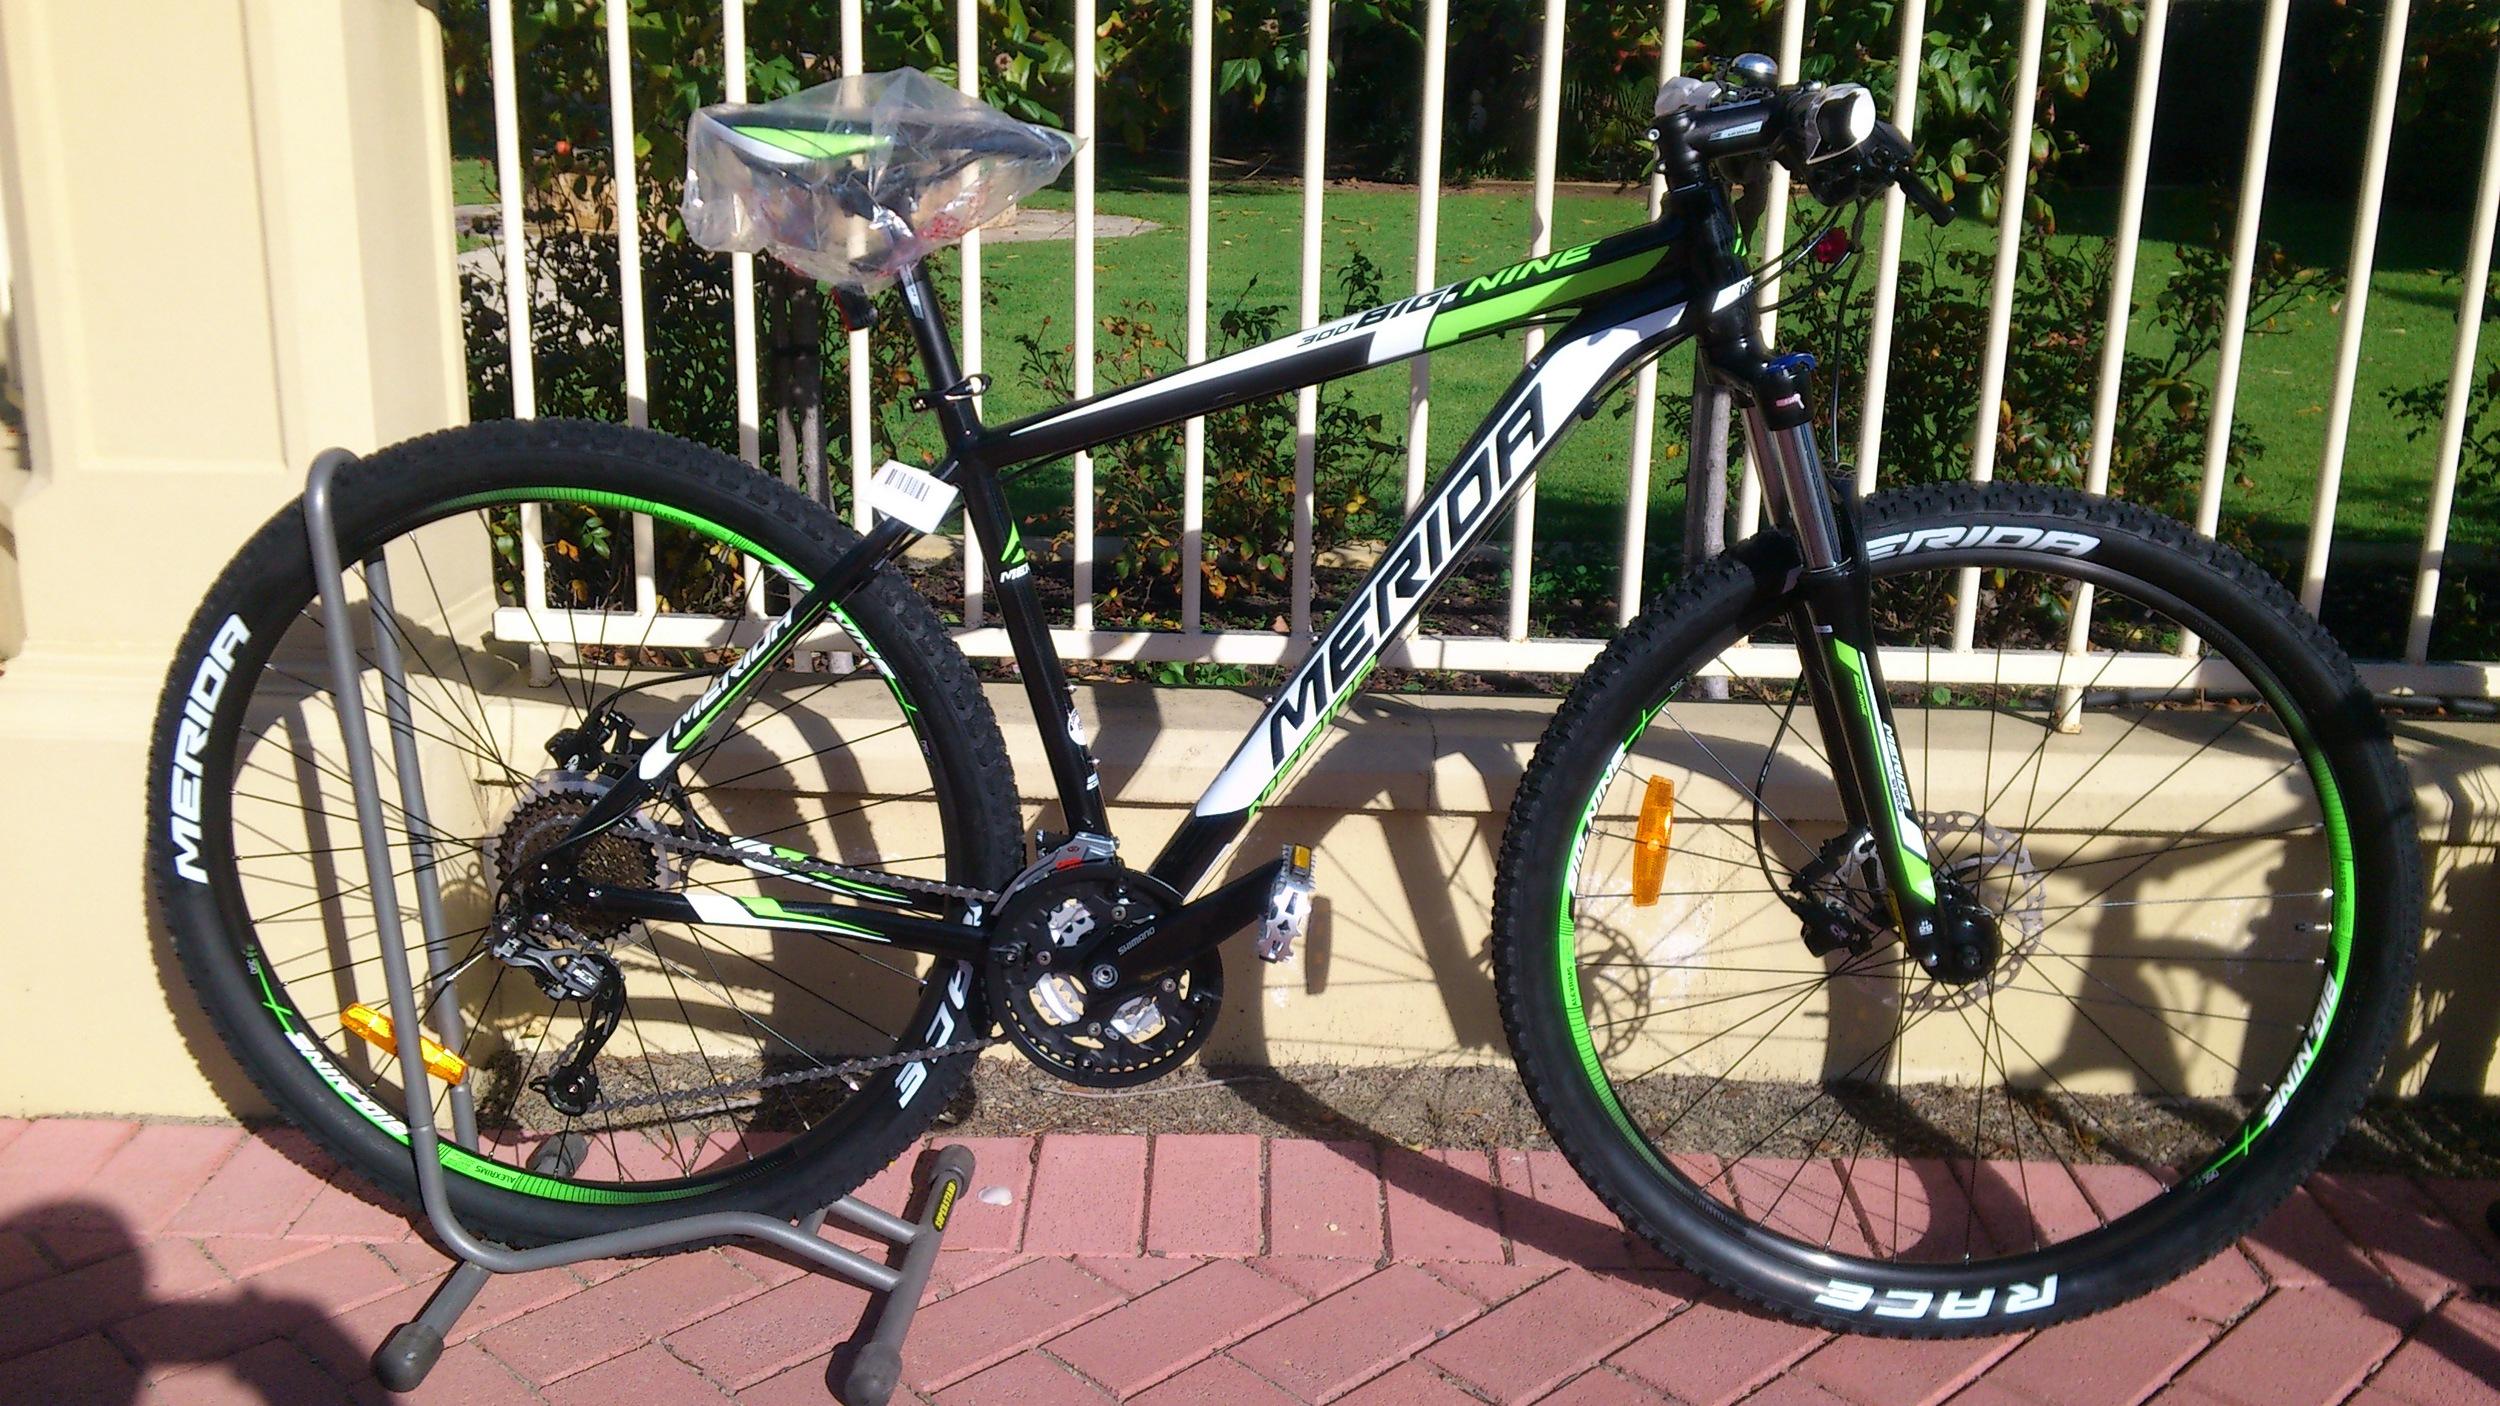 Merida big nine 300 2014  In team green